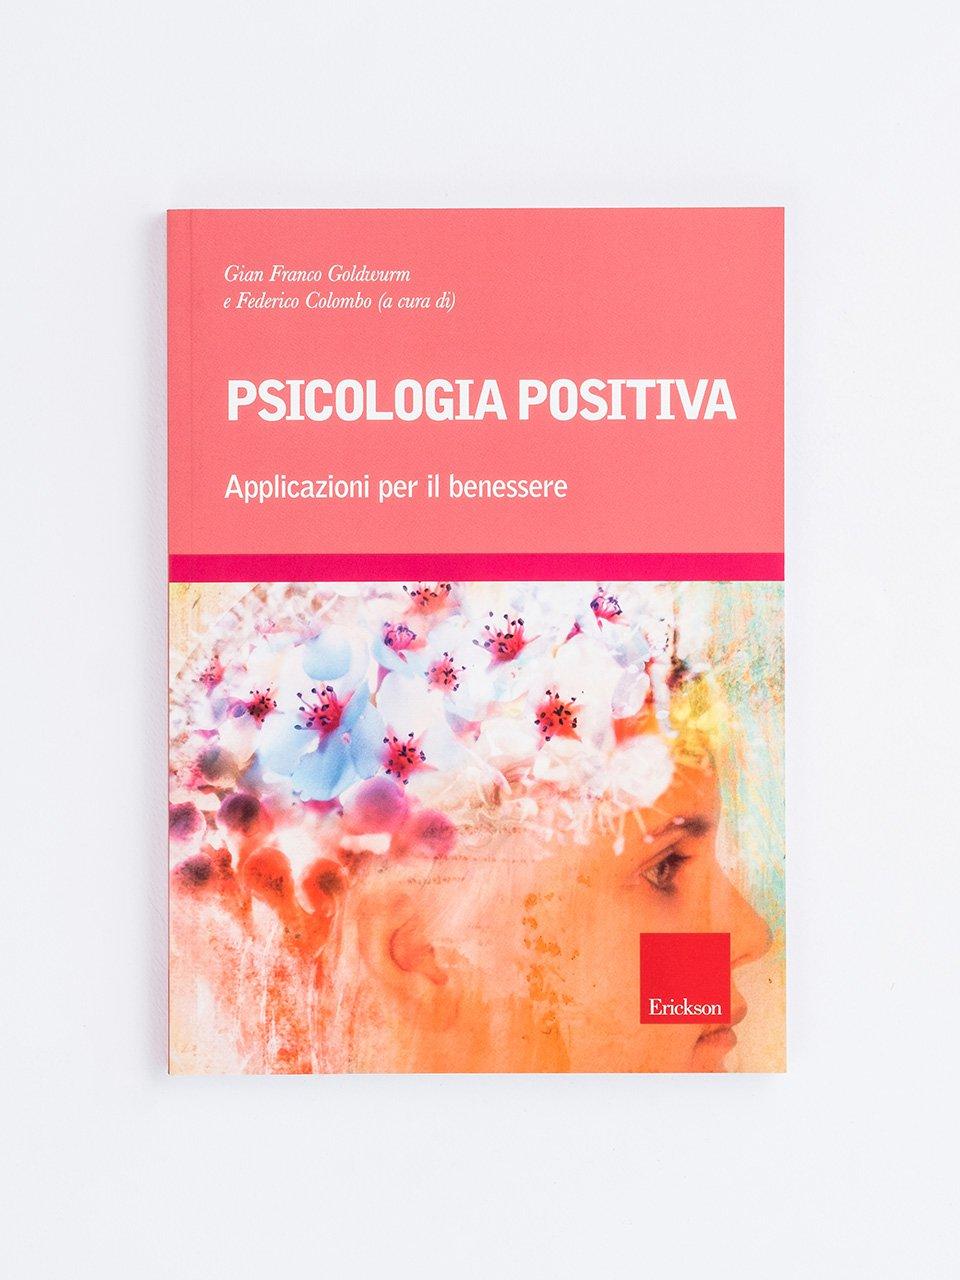 Psicologia positiva - Neuropsichiatria infantile - Erickson